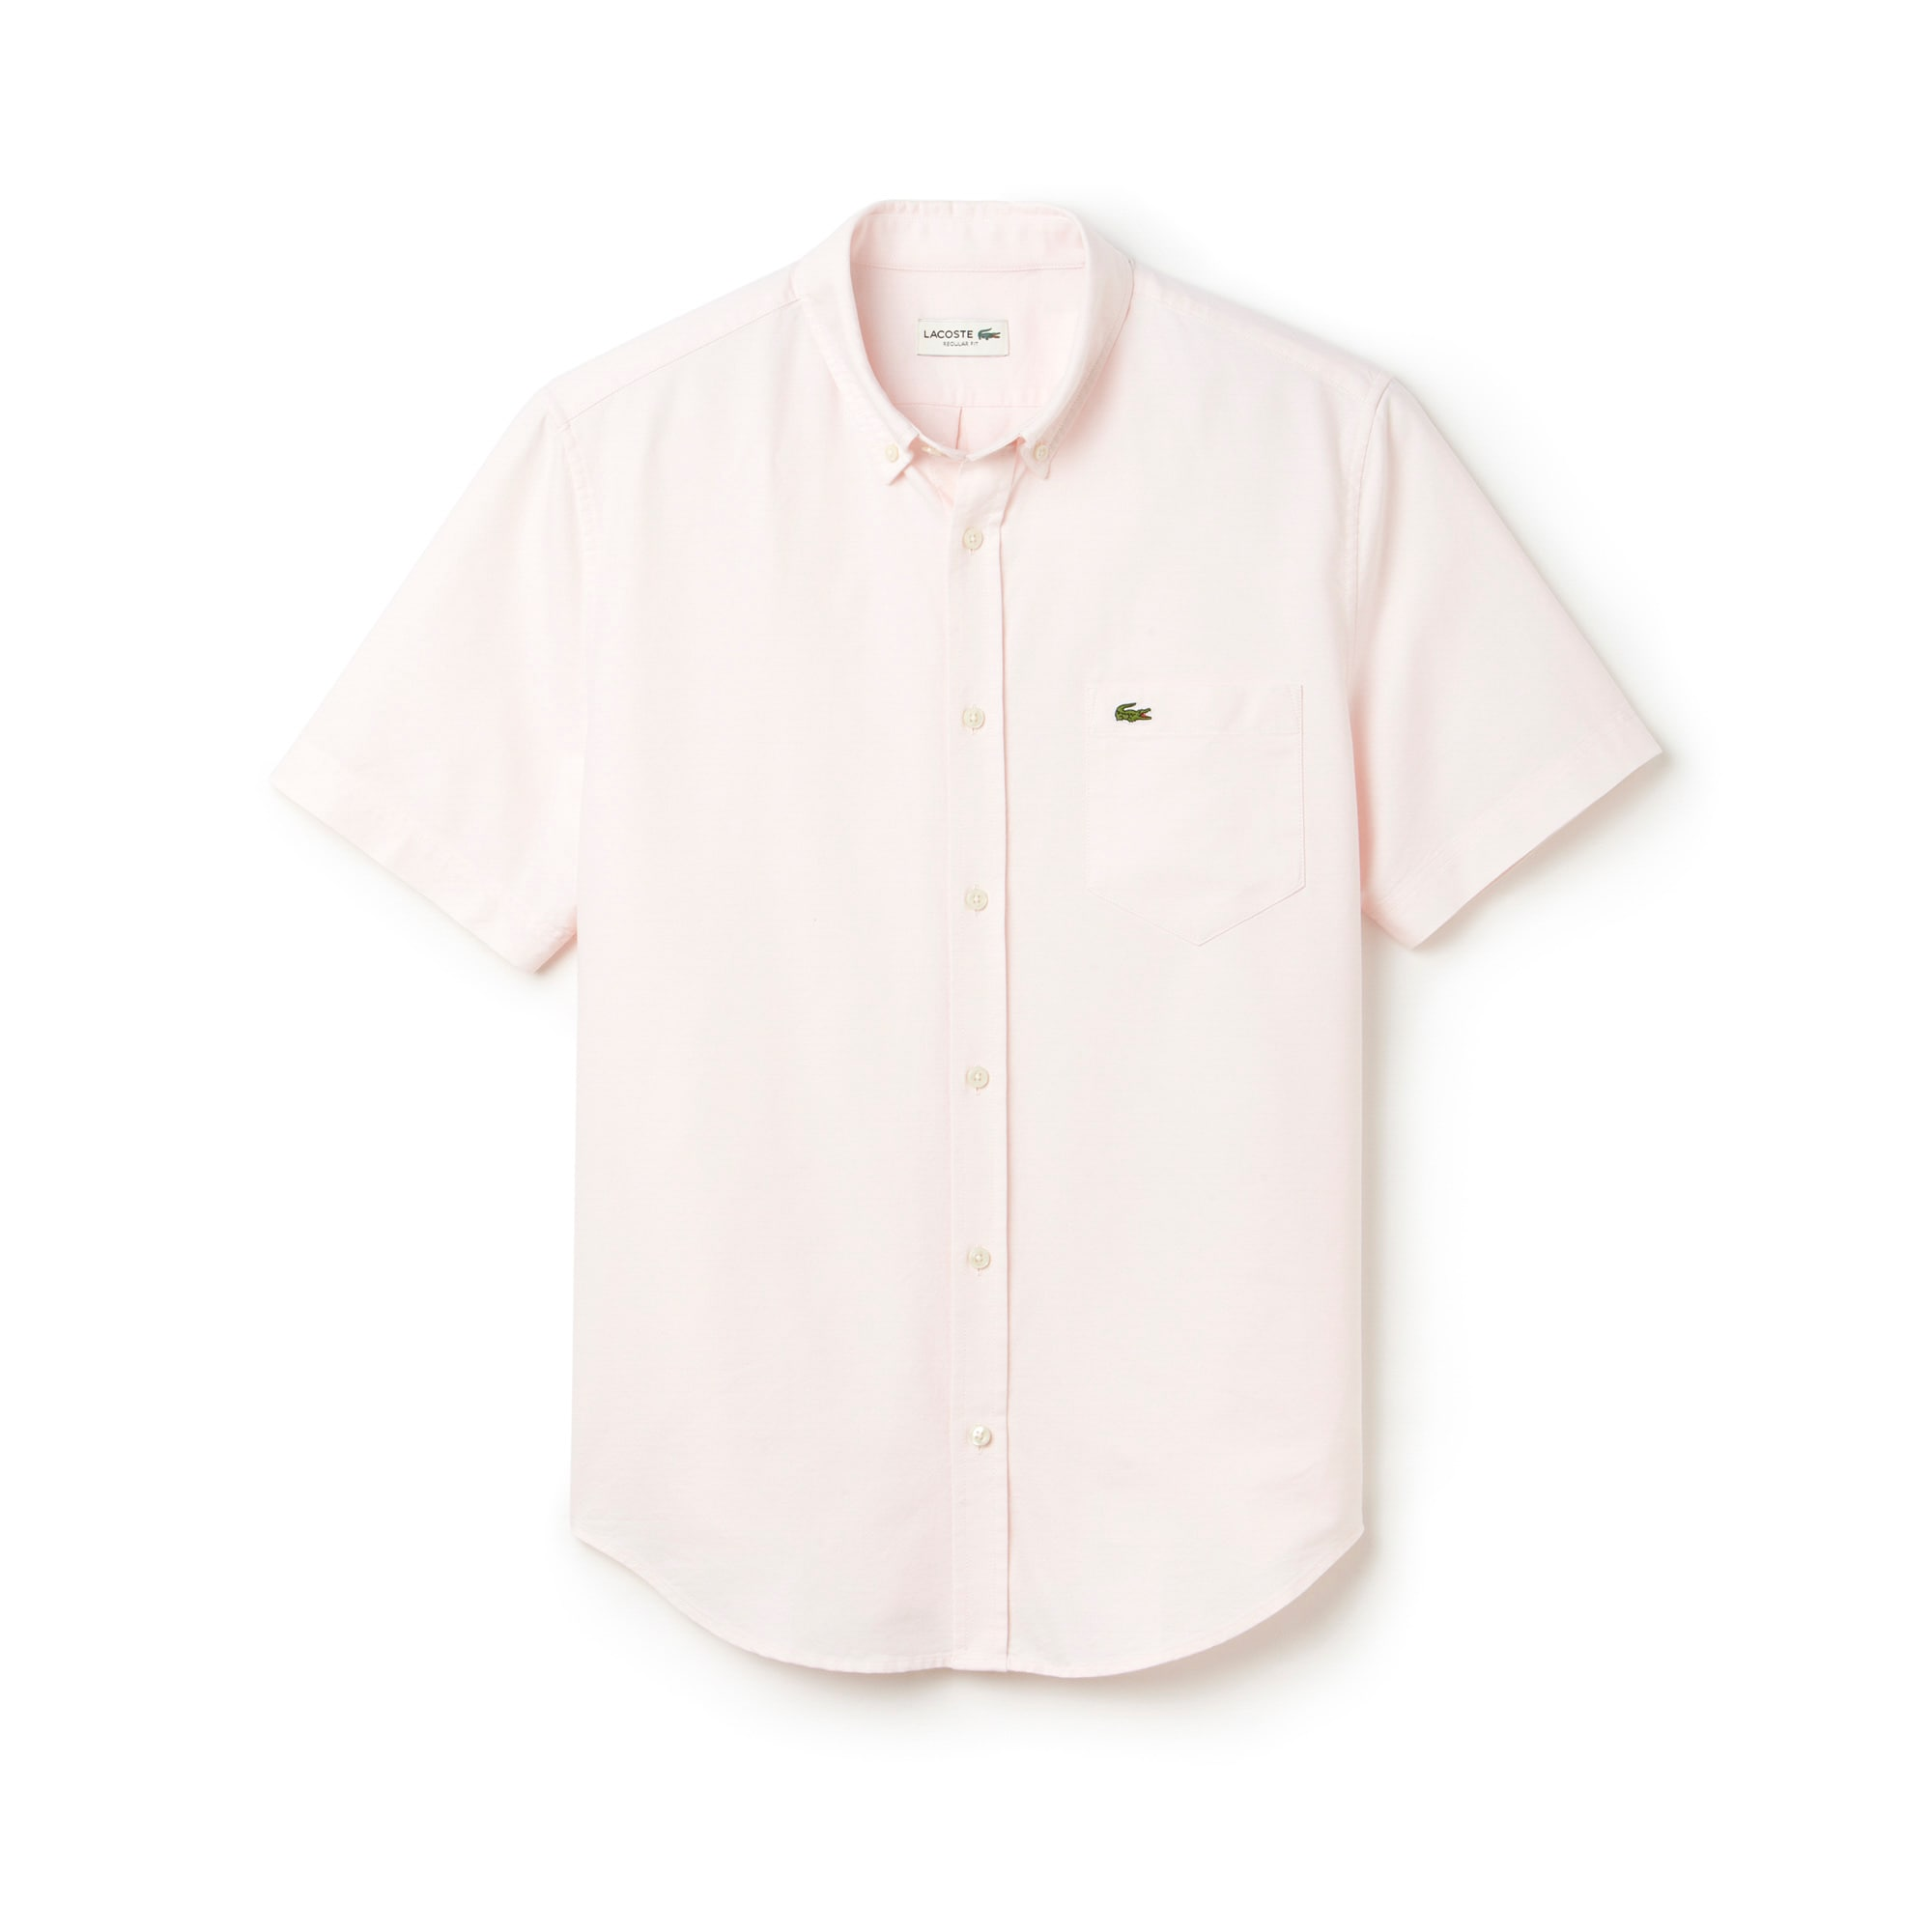 Men's Oxford Cotton Shirt